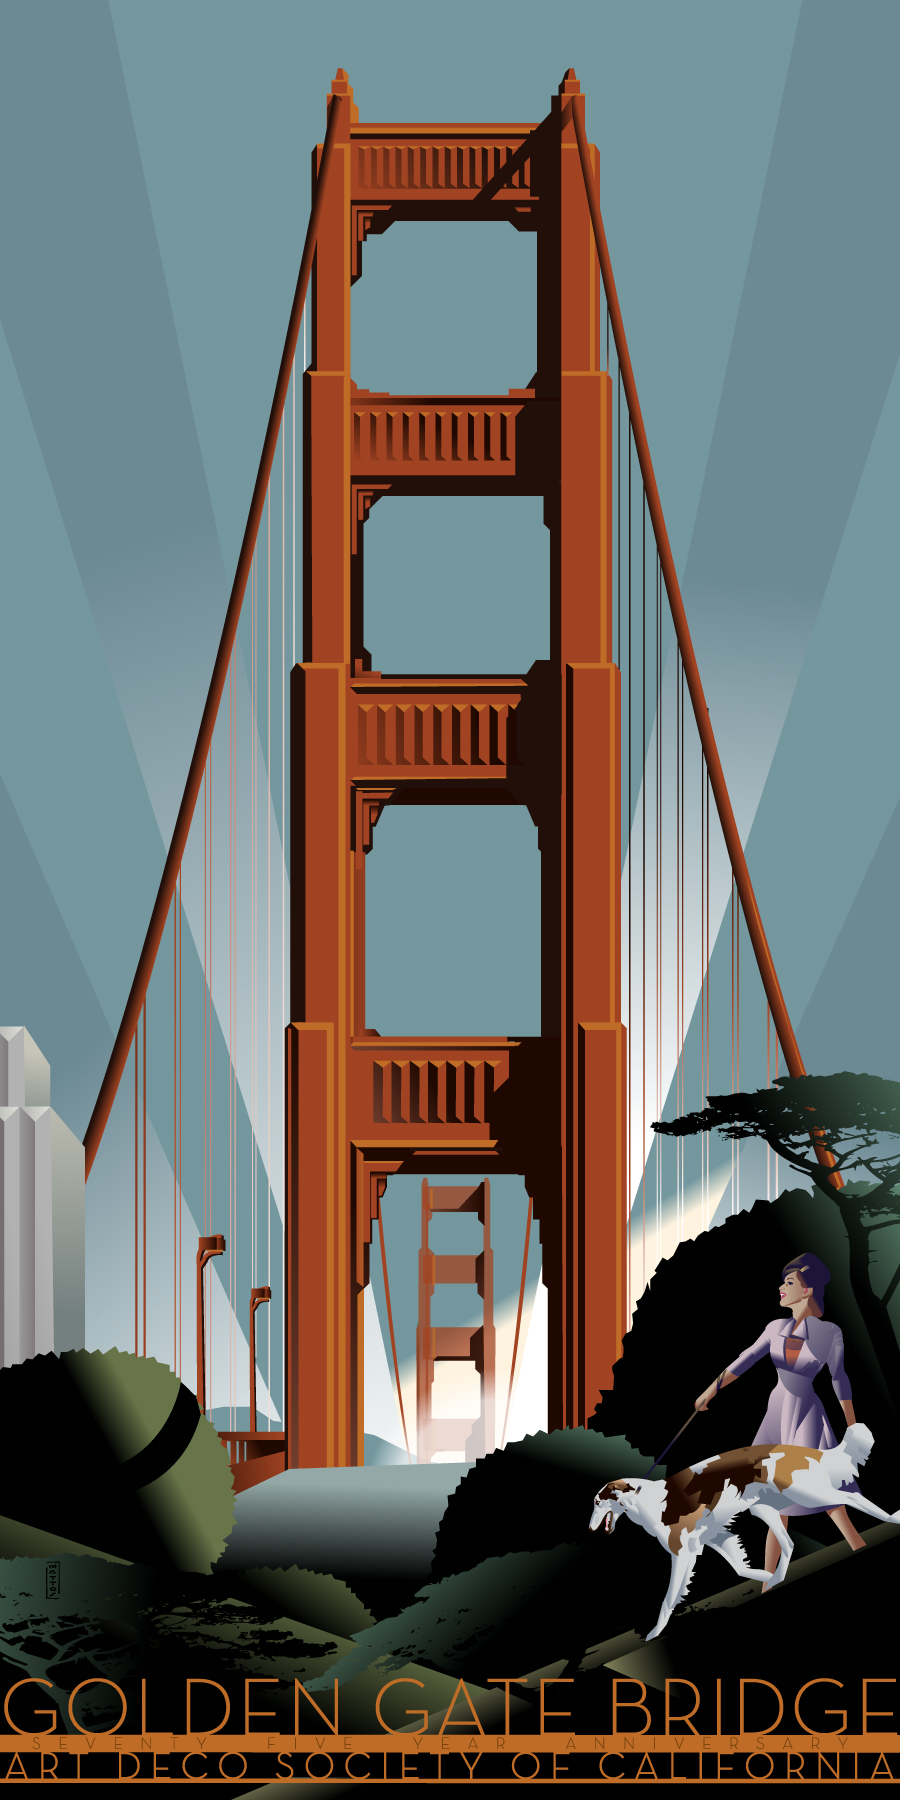 Art Deco Society Of California Golden Gate Bridge Poster Diagram The